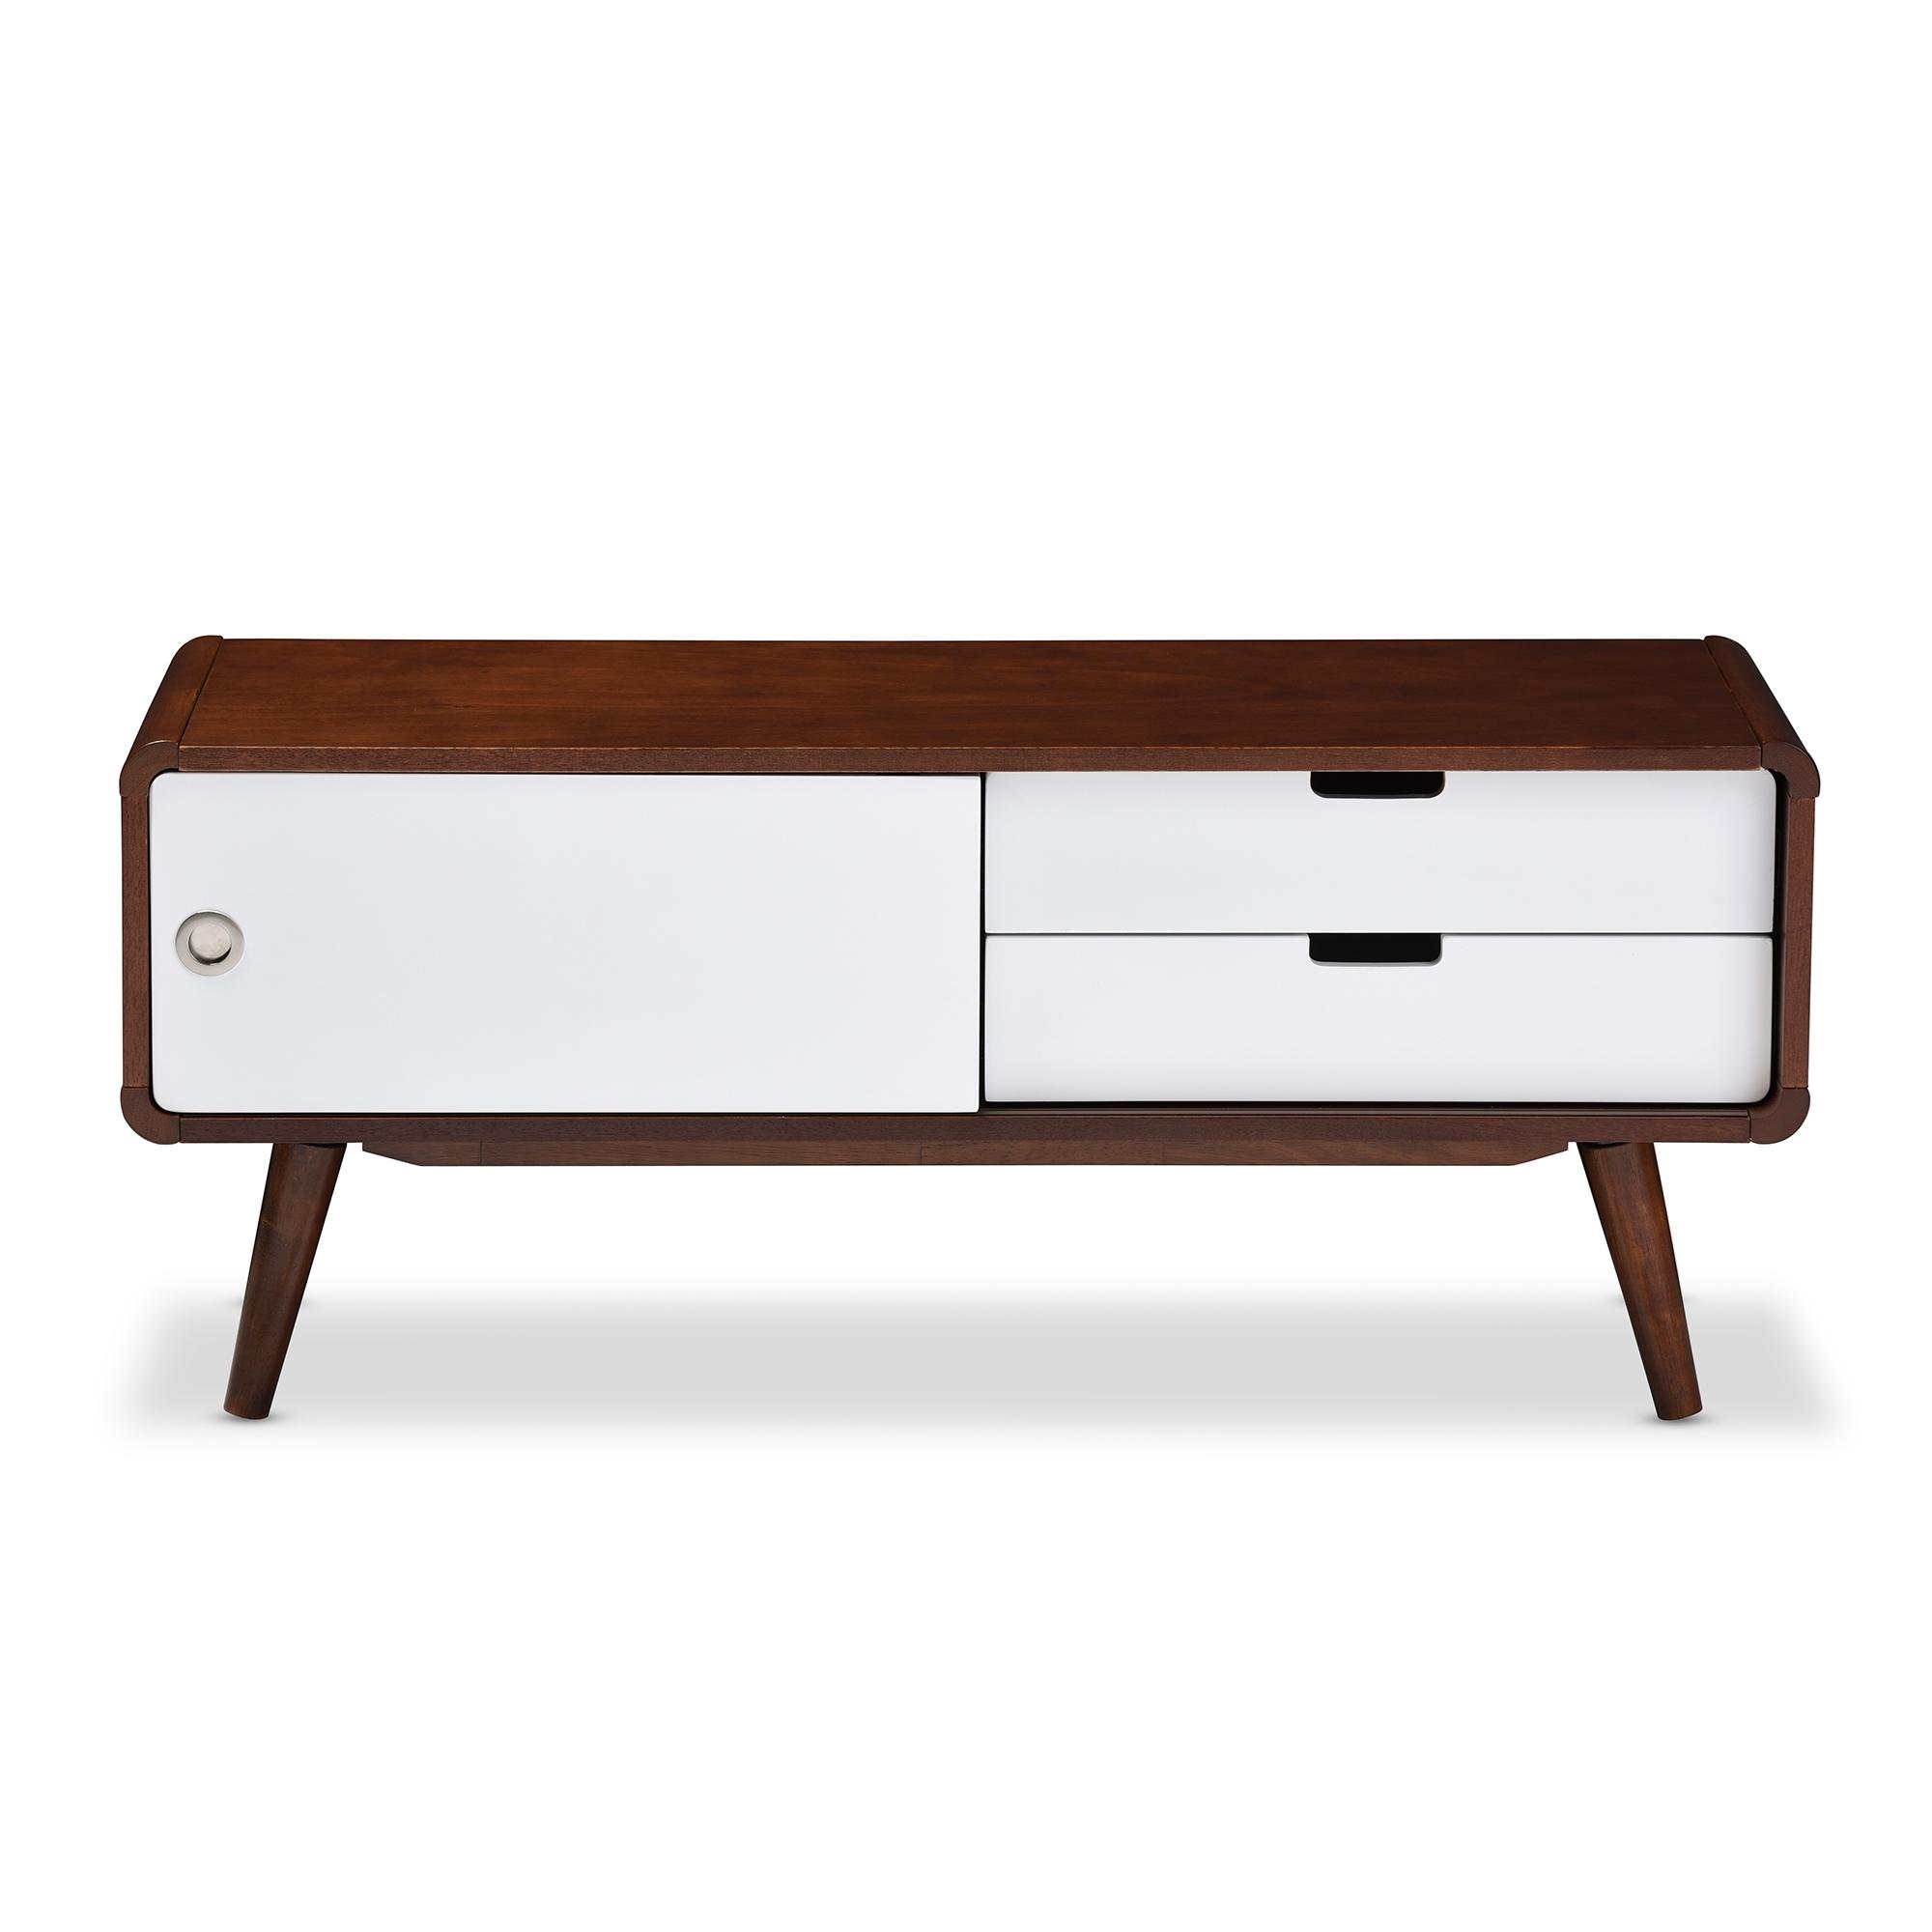 inexpensive mid century modern furniture. baxton studio armani midcentury modern dark walnut and white twotone finish 2 inexpensive mid century furniture t